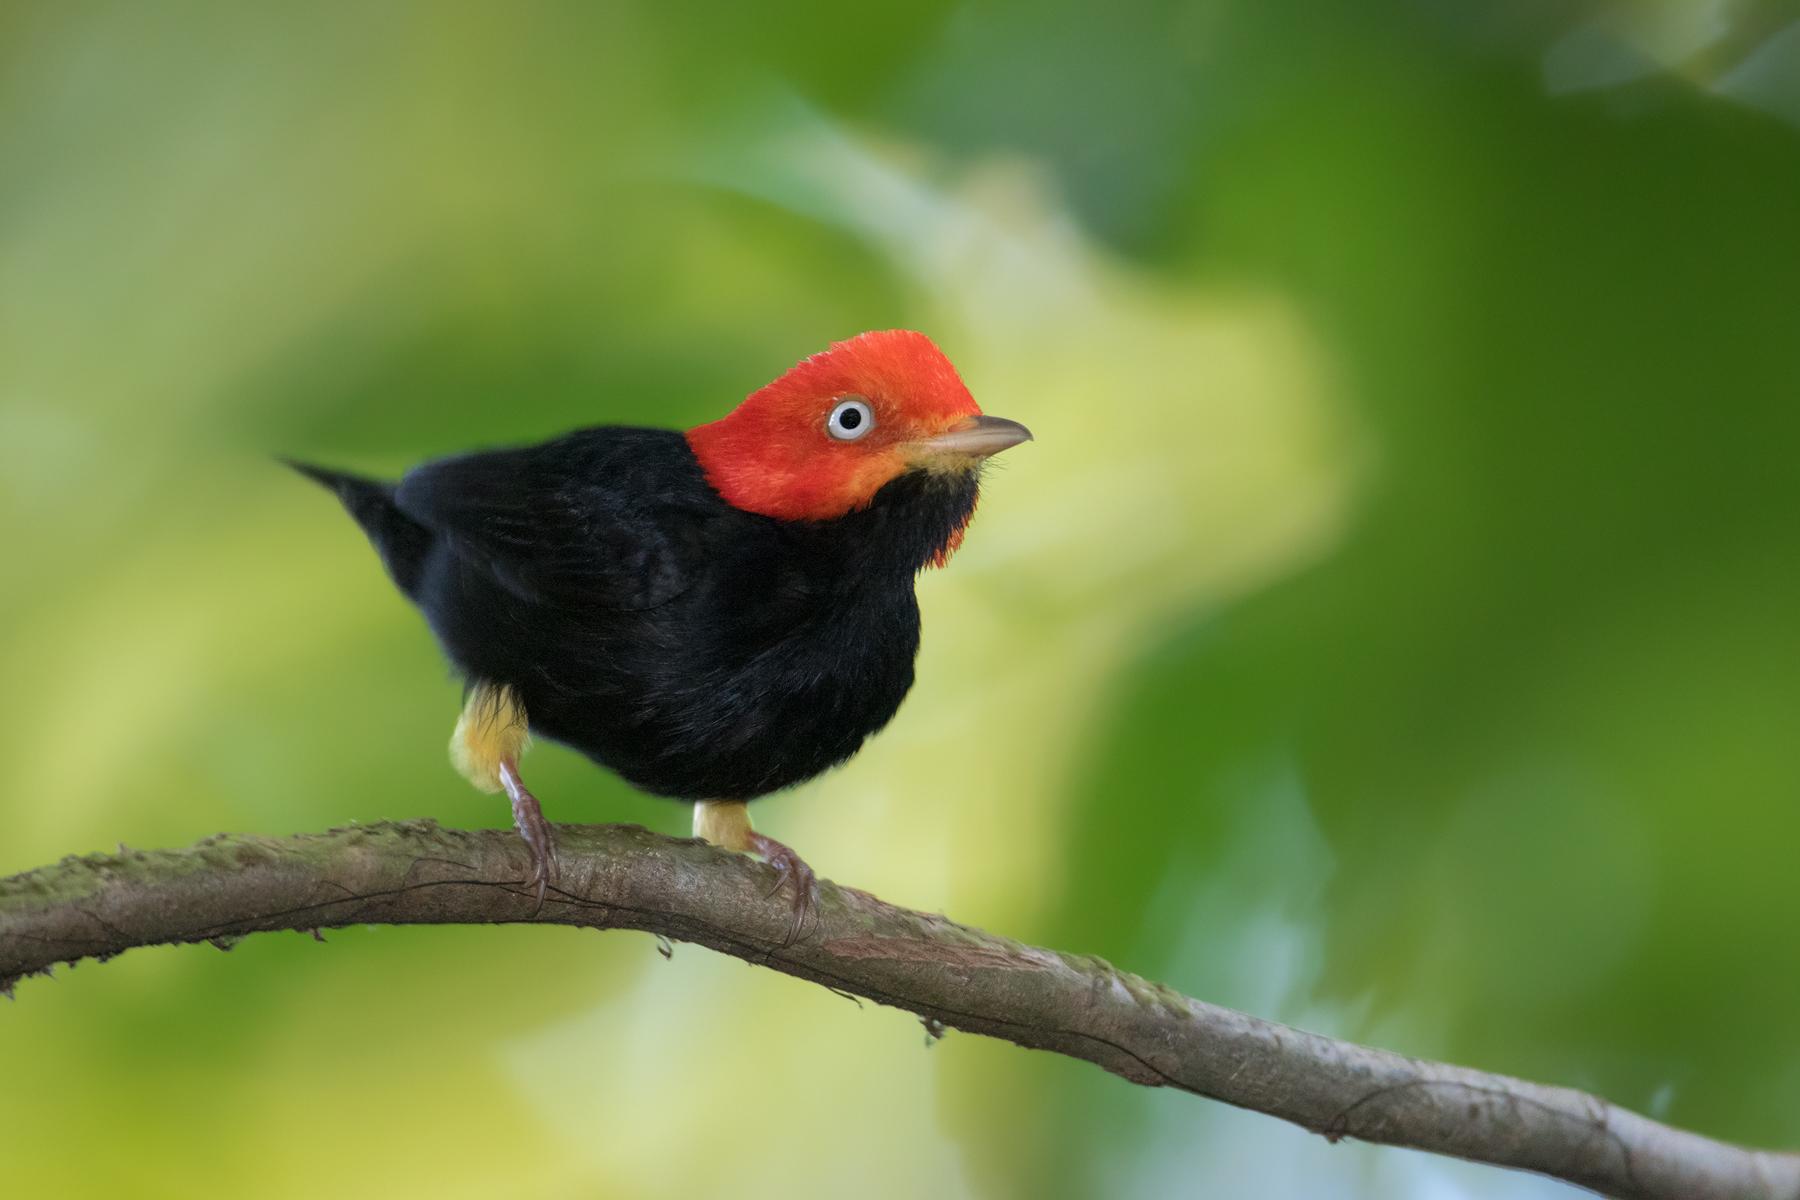 Red-capped Manakin, Costa Rica